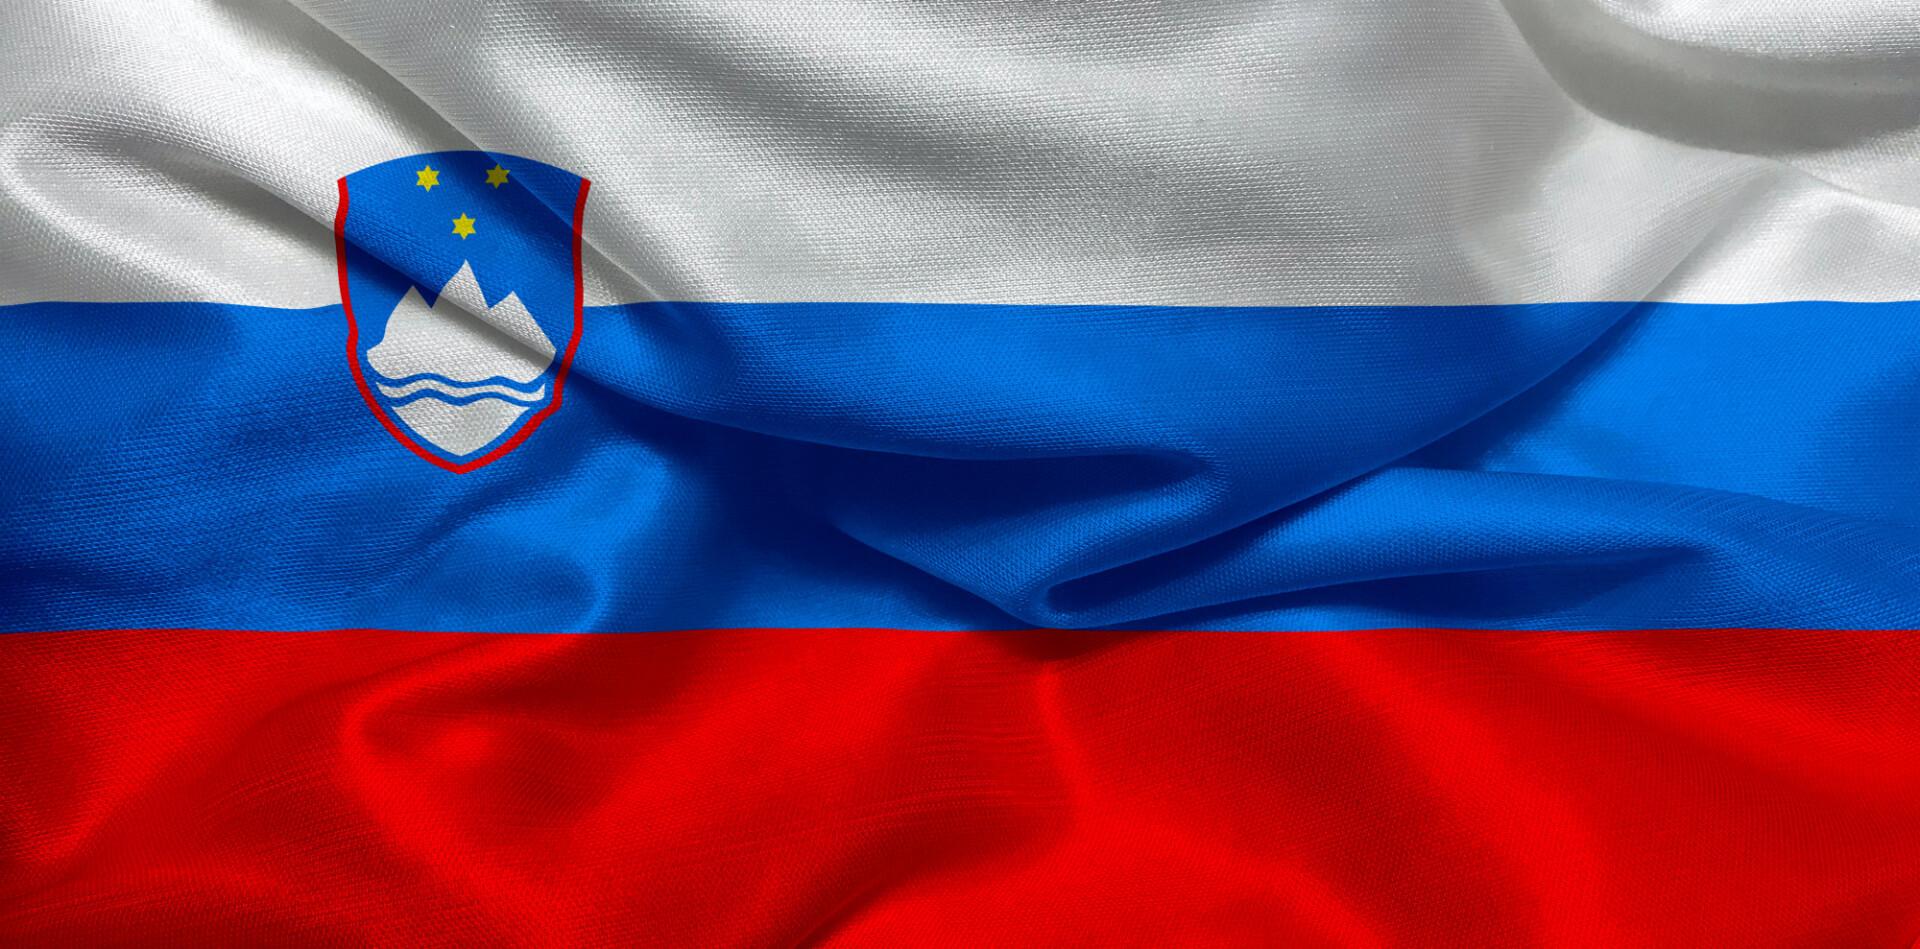 The flag of Slovenia